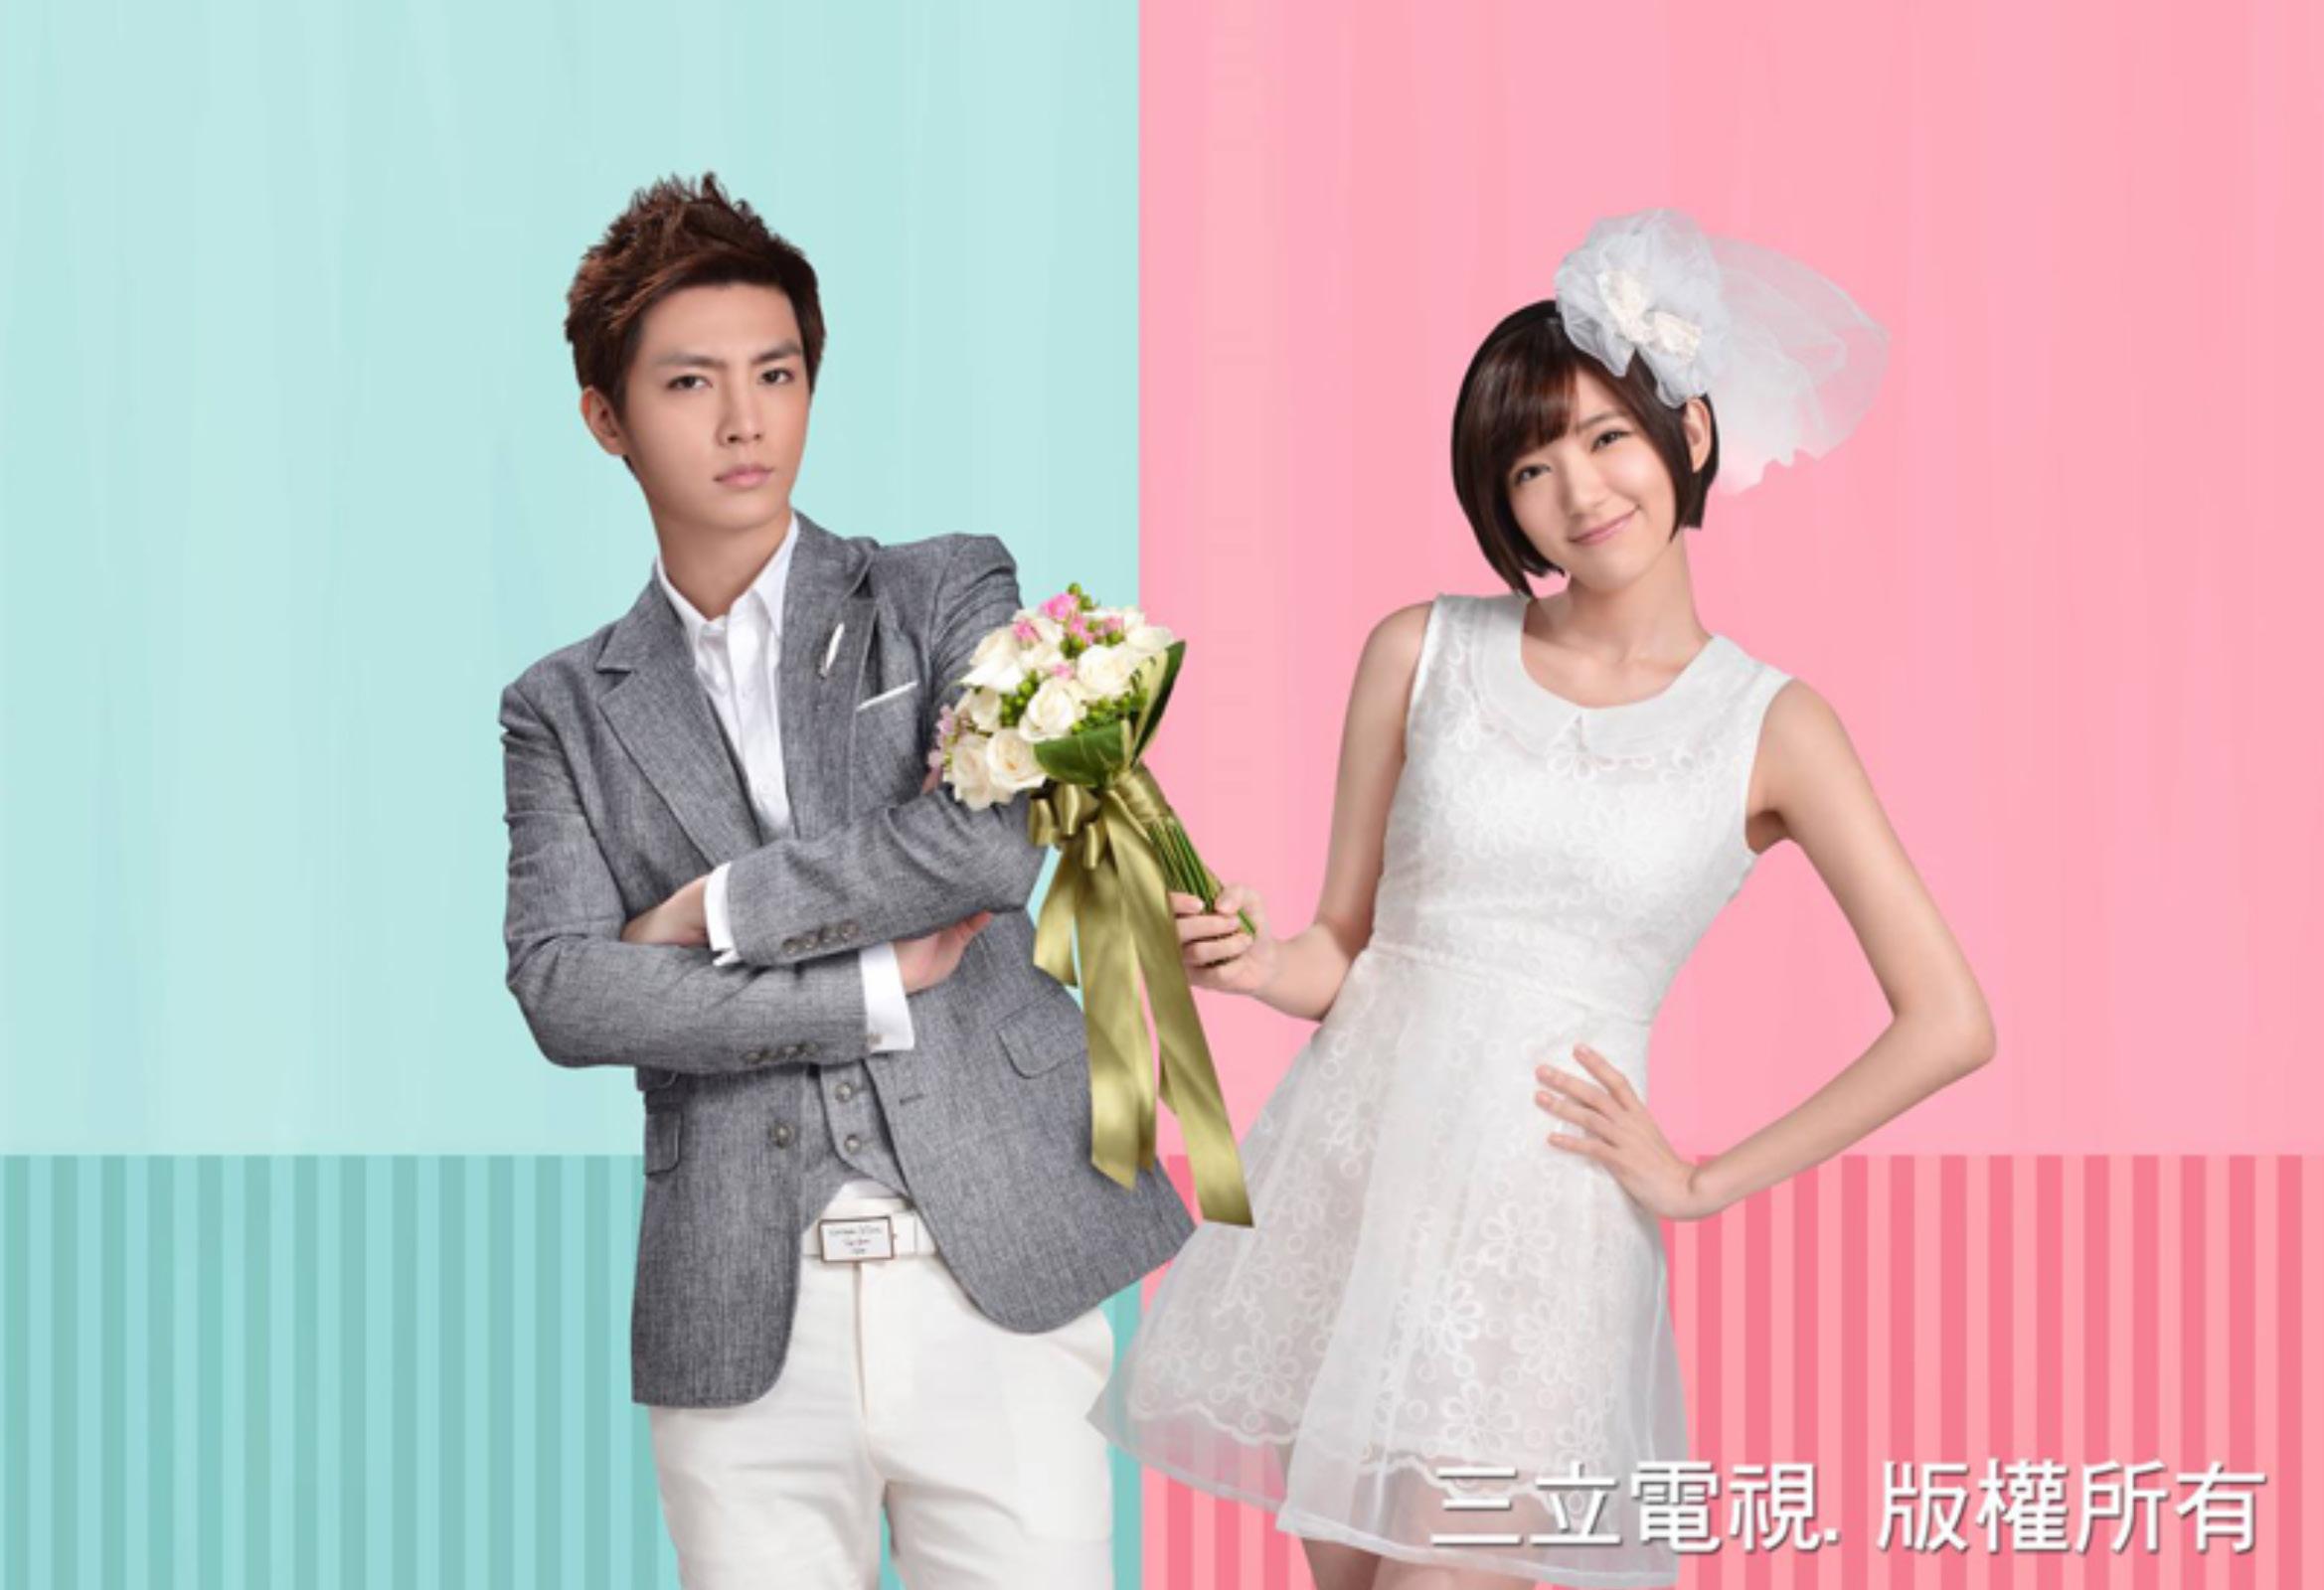 Aaron Yan and Puff Kuo, stars of Taiwanese drama Just You